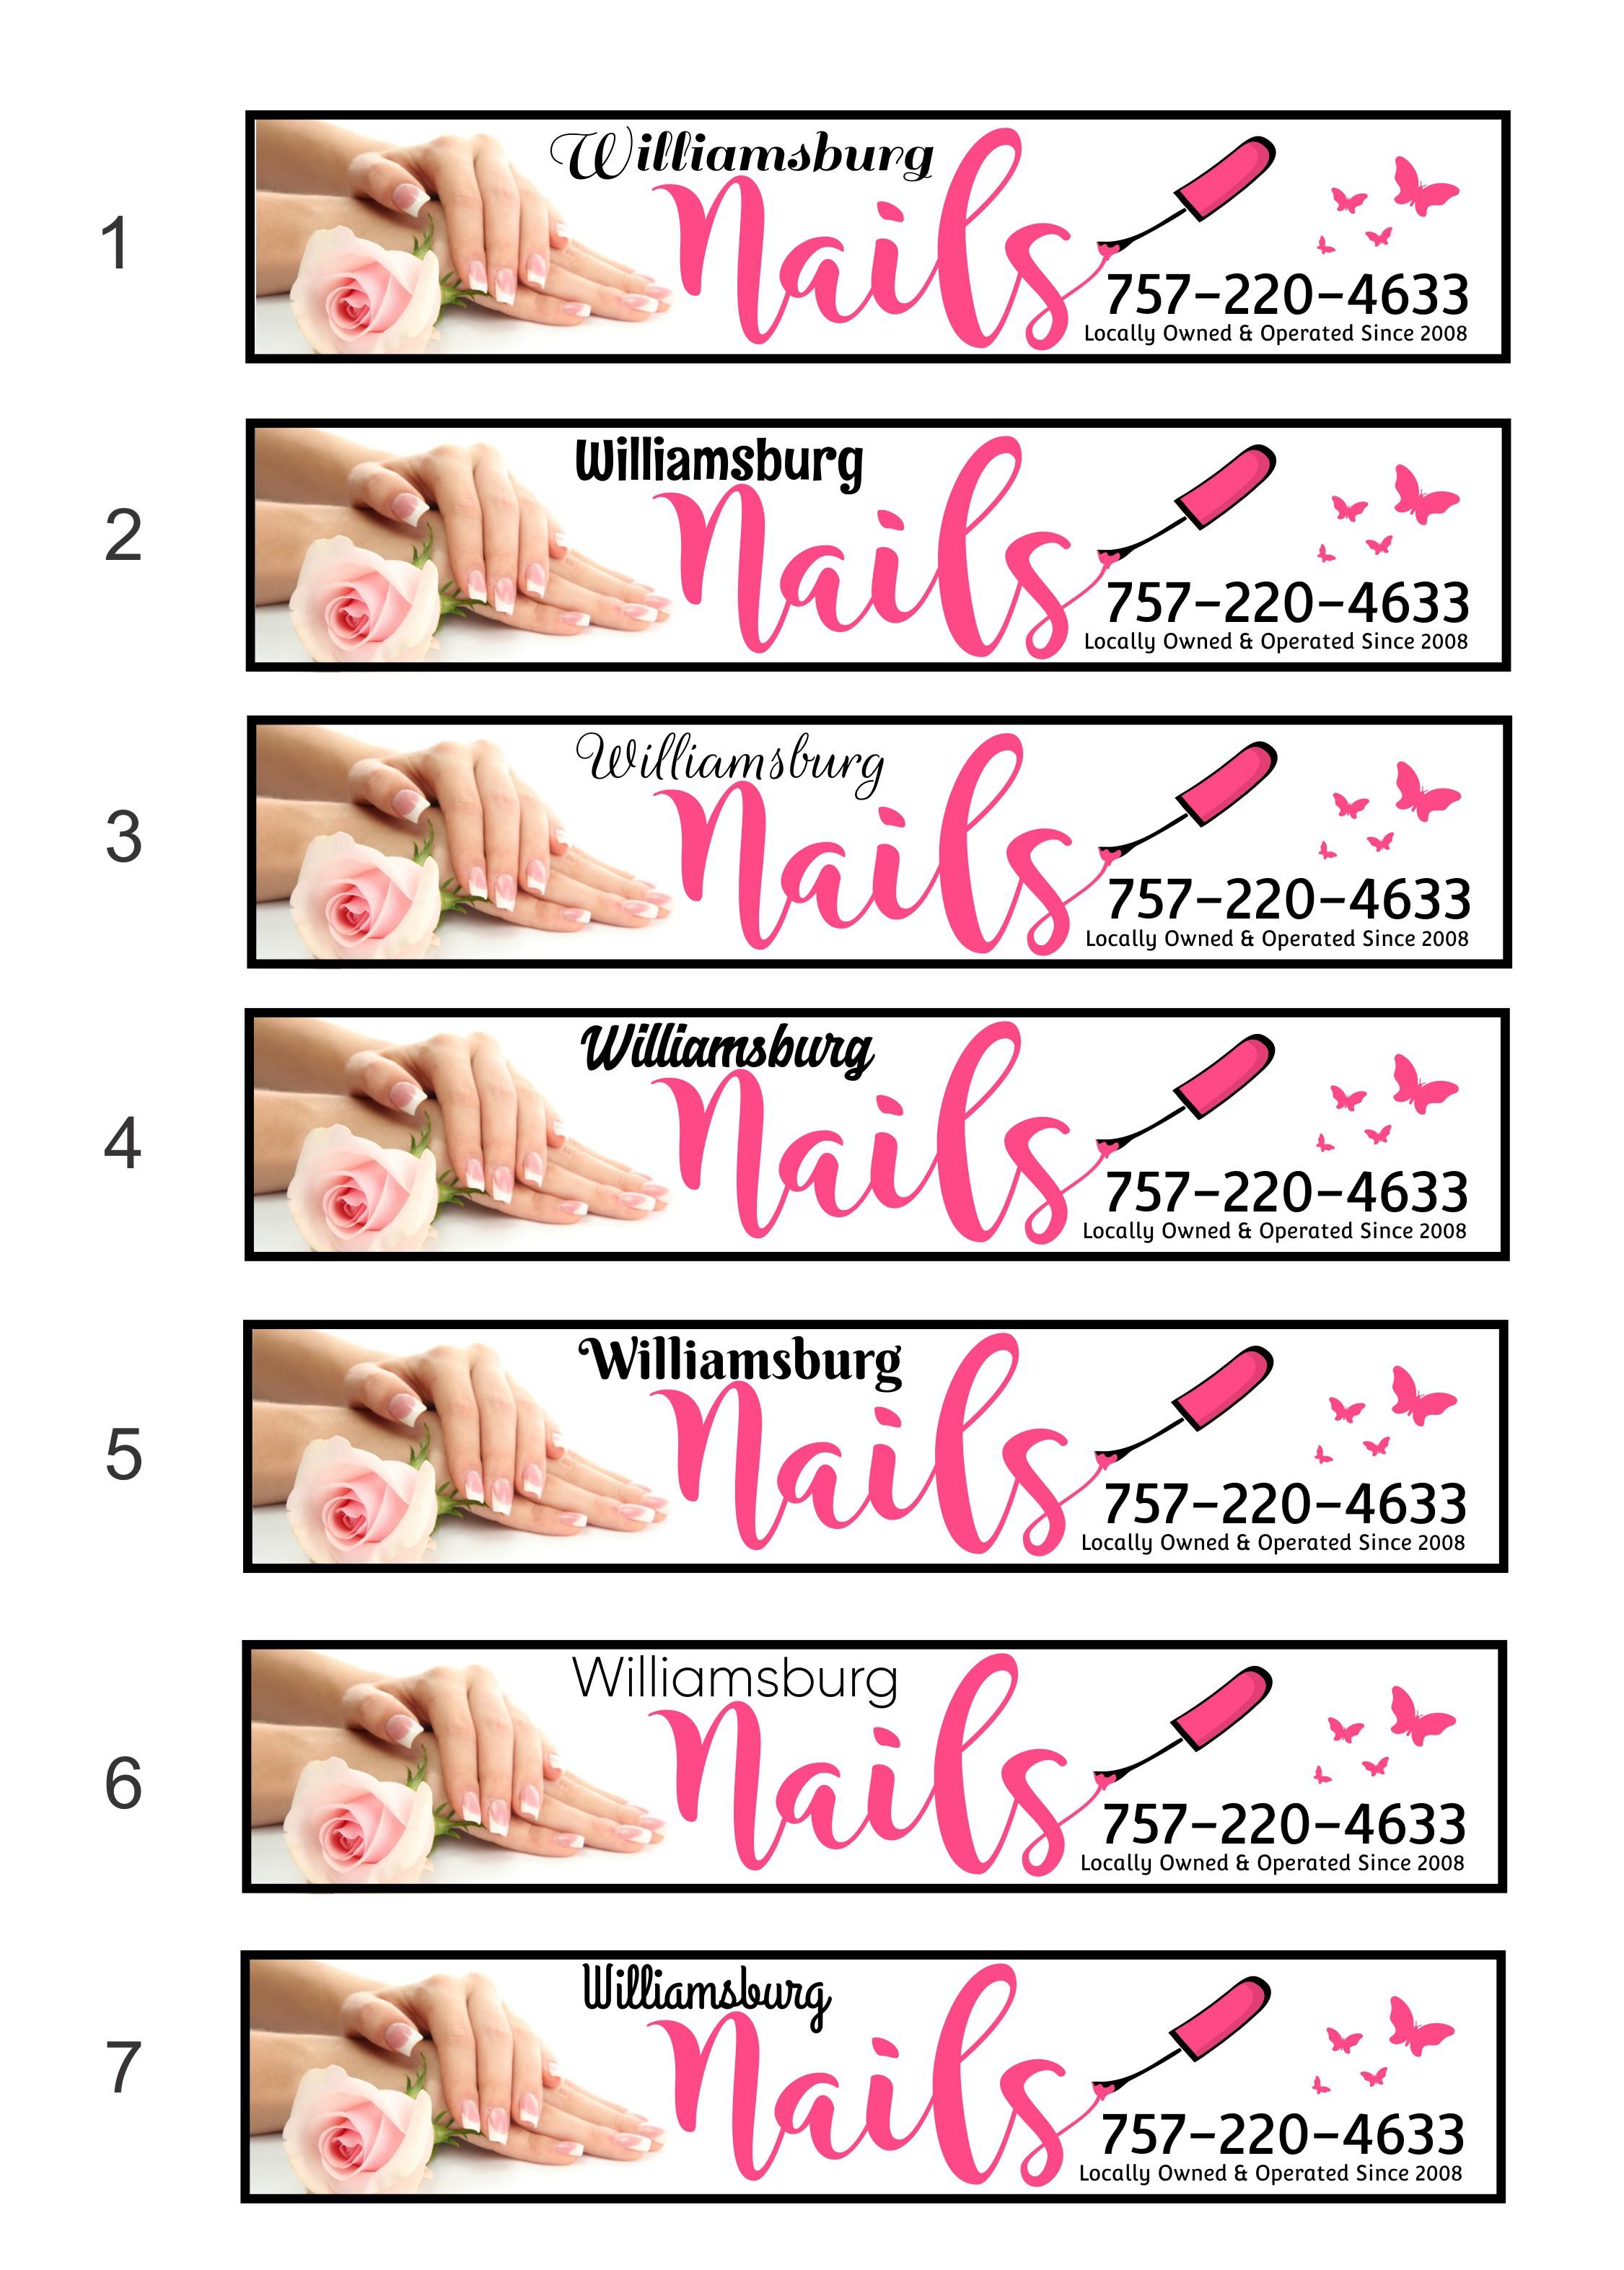 Williamsburg Nails needs an eye catching signage design